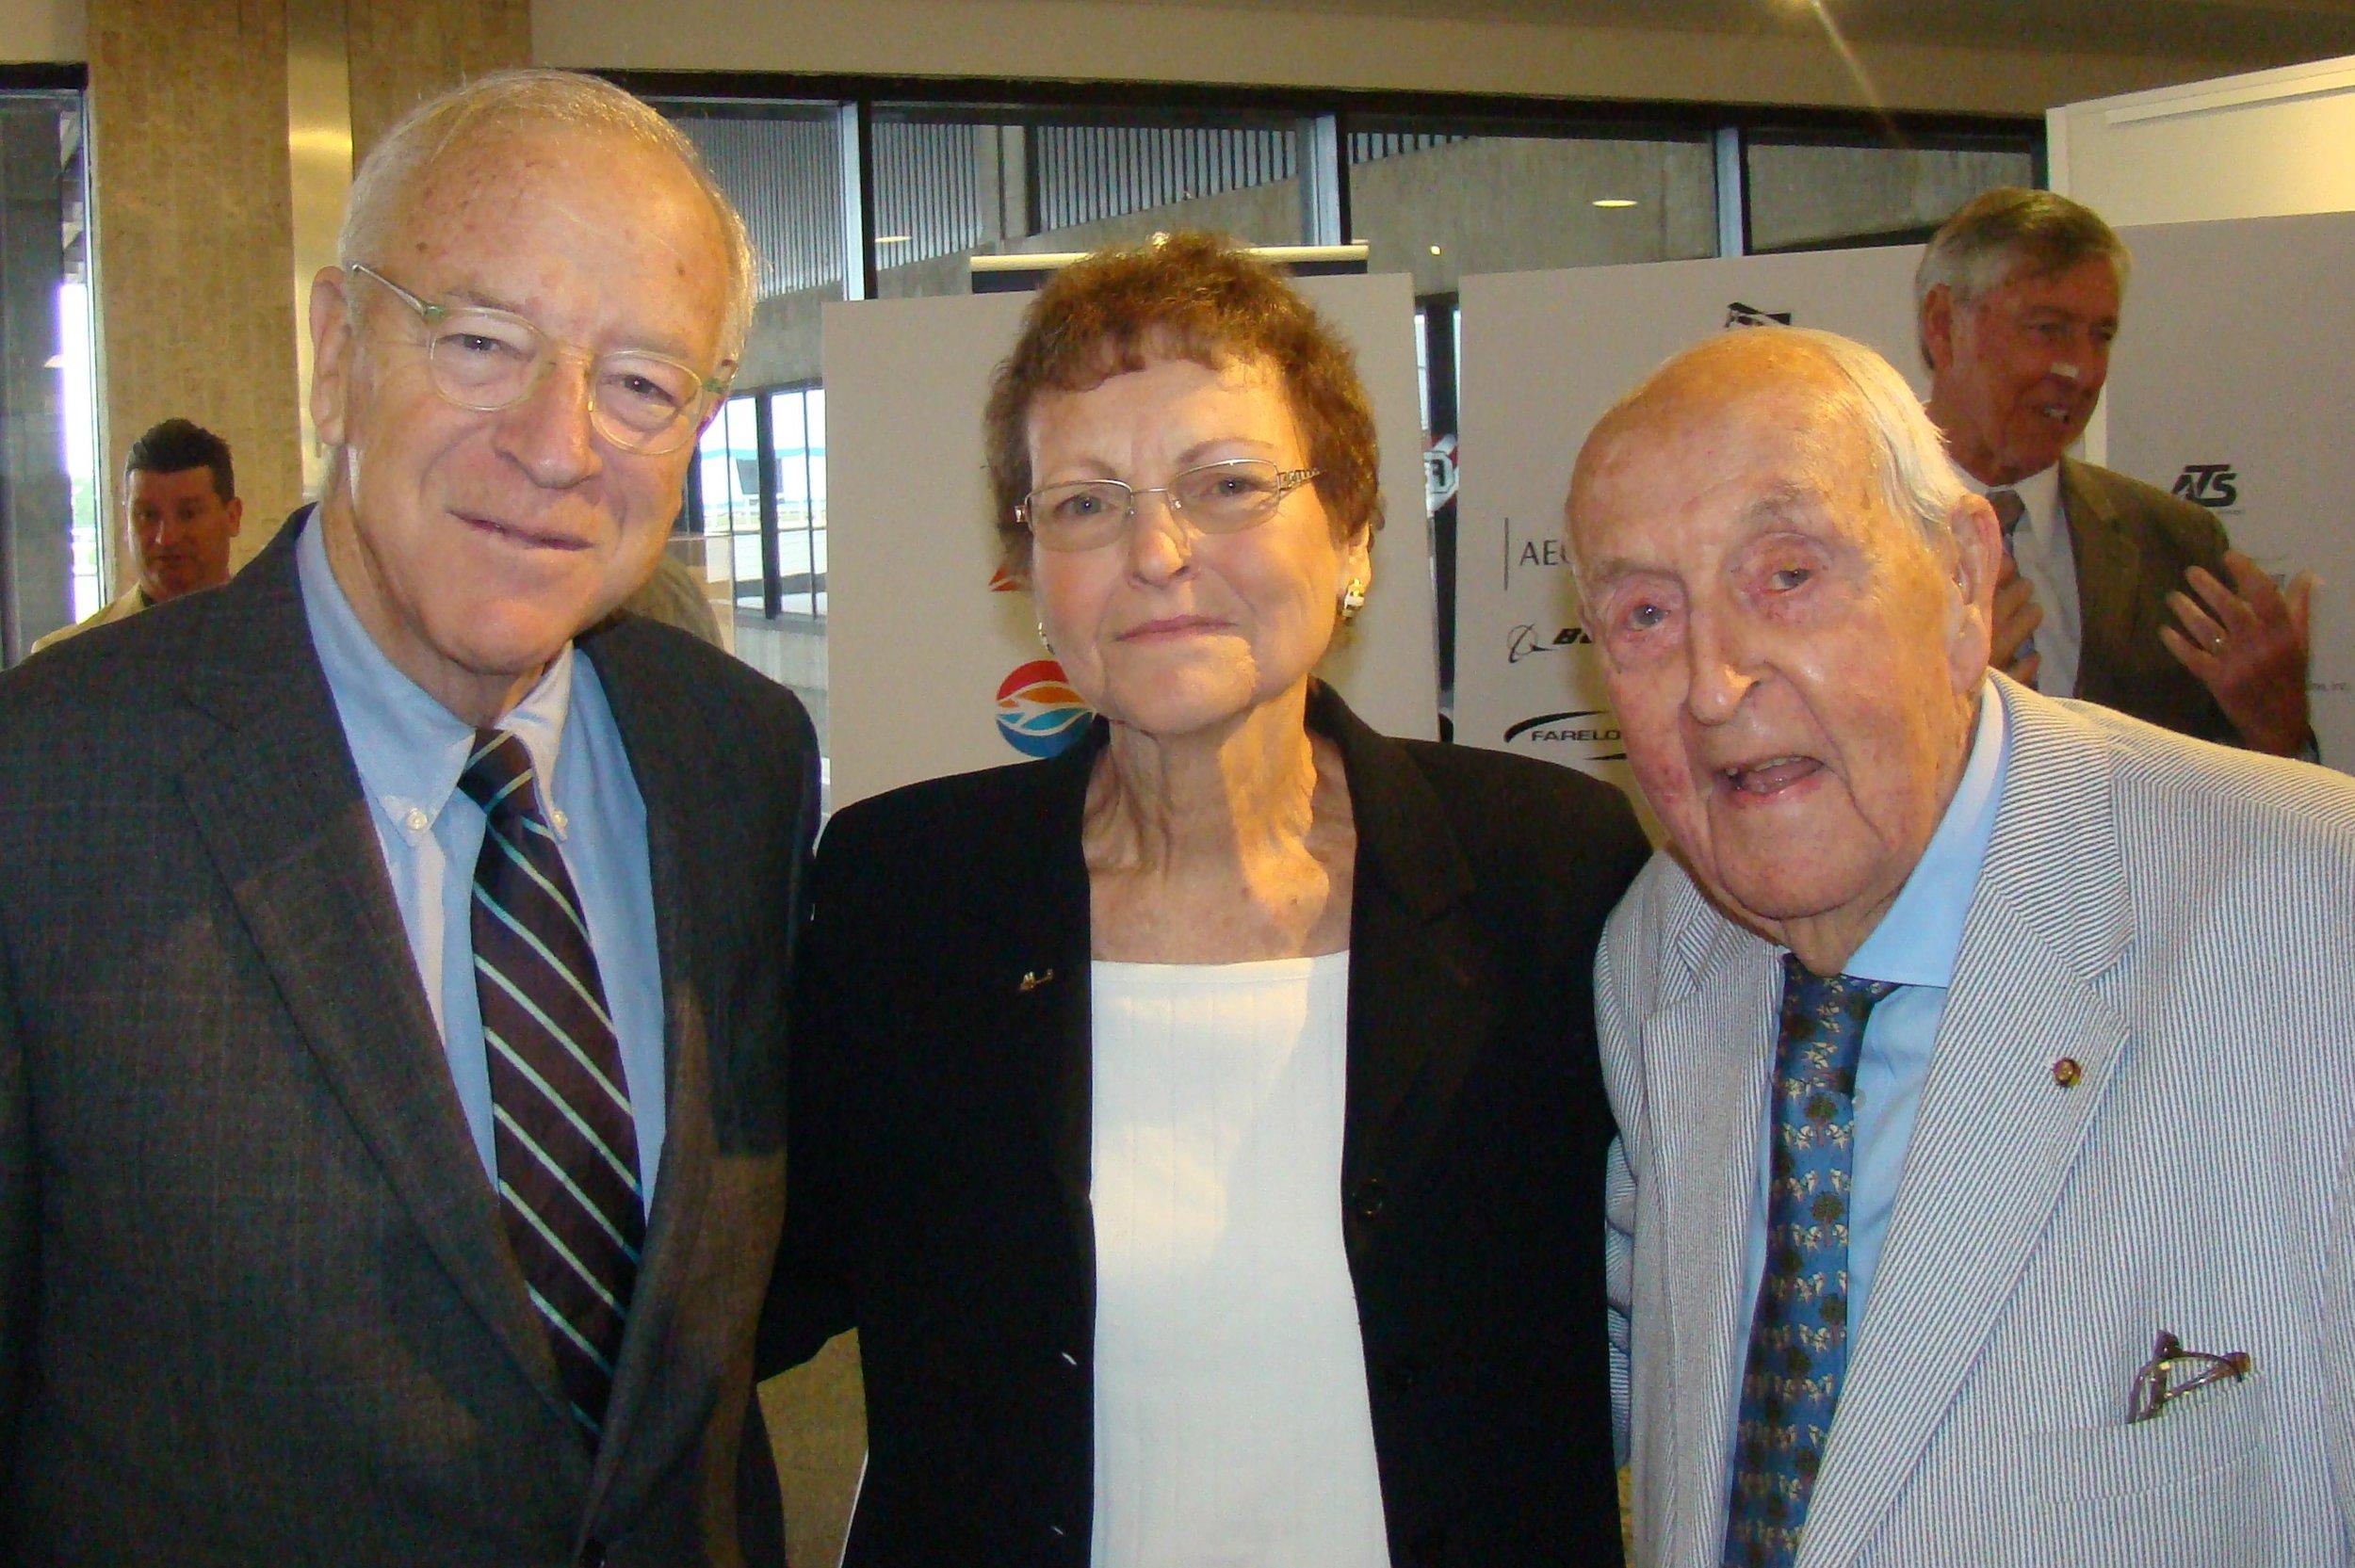 Bronson Thayer, Kim Michael & Sir Lenox Hewitt - 2, 15 Nov '13.JPG